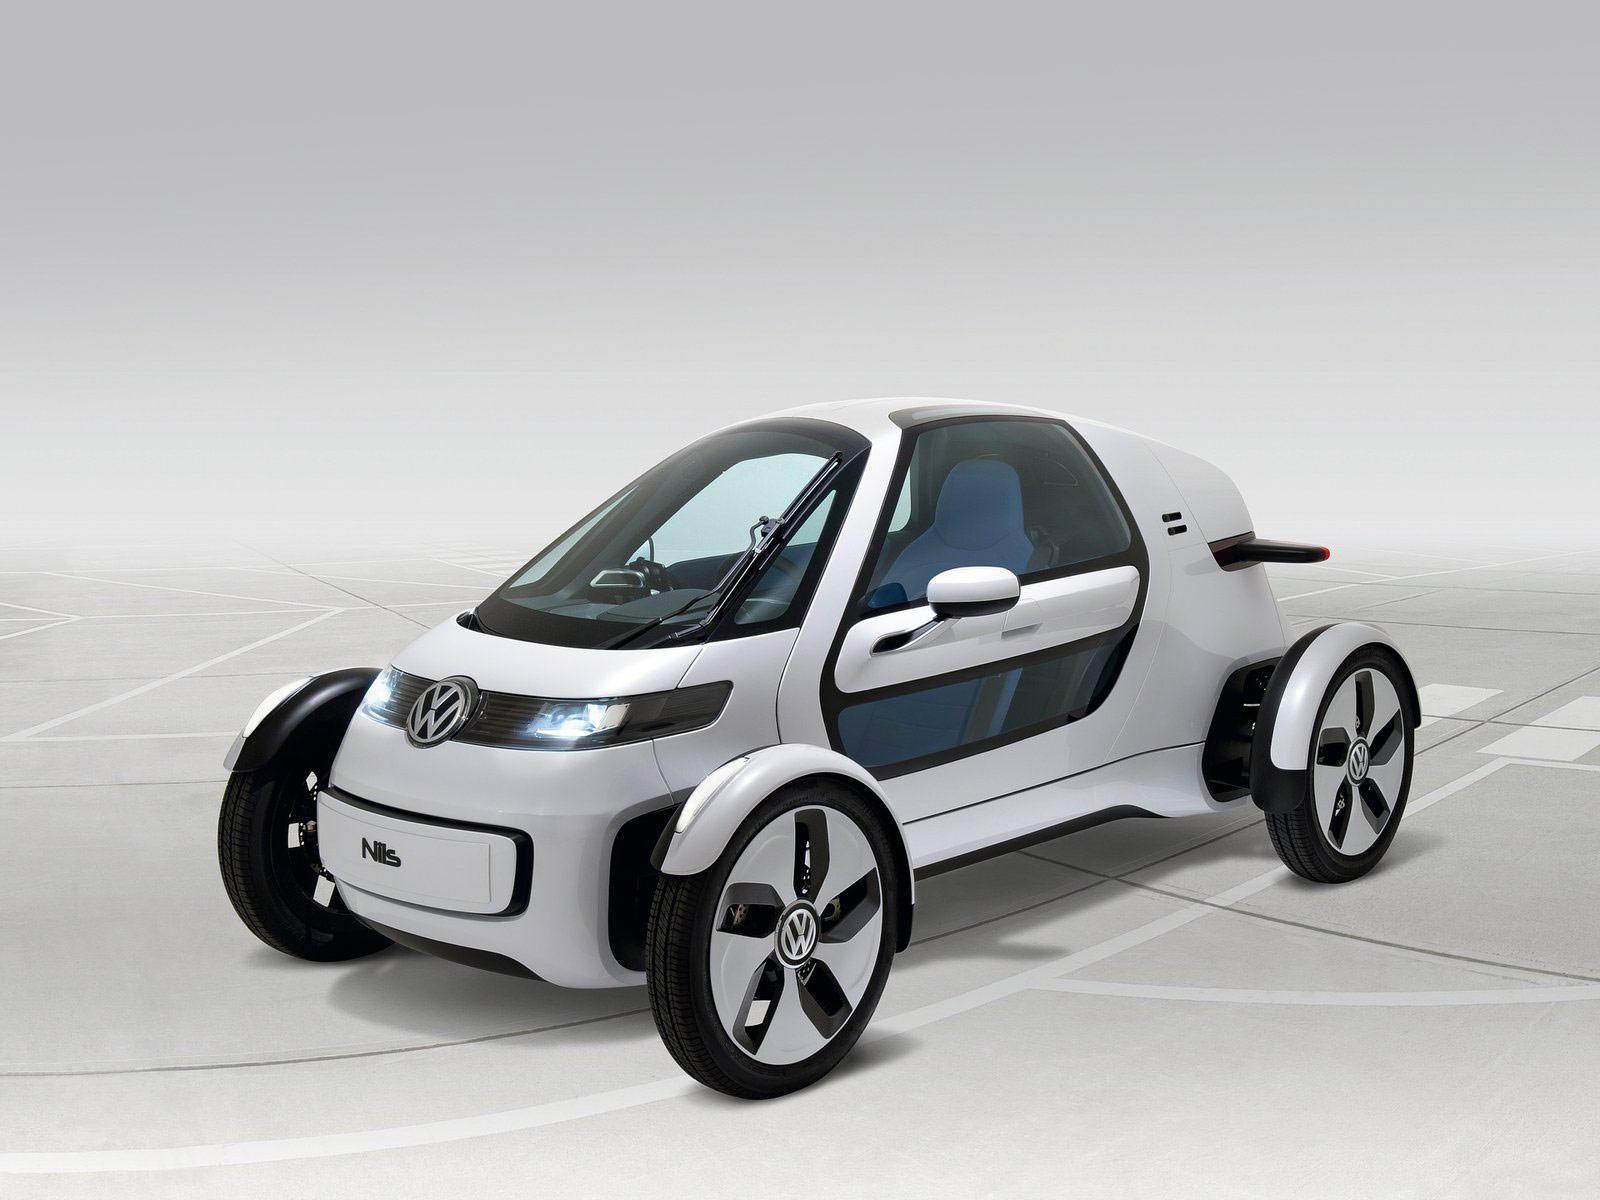 2011 Volkswagen NILS Concept - Auto Trends Magazine